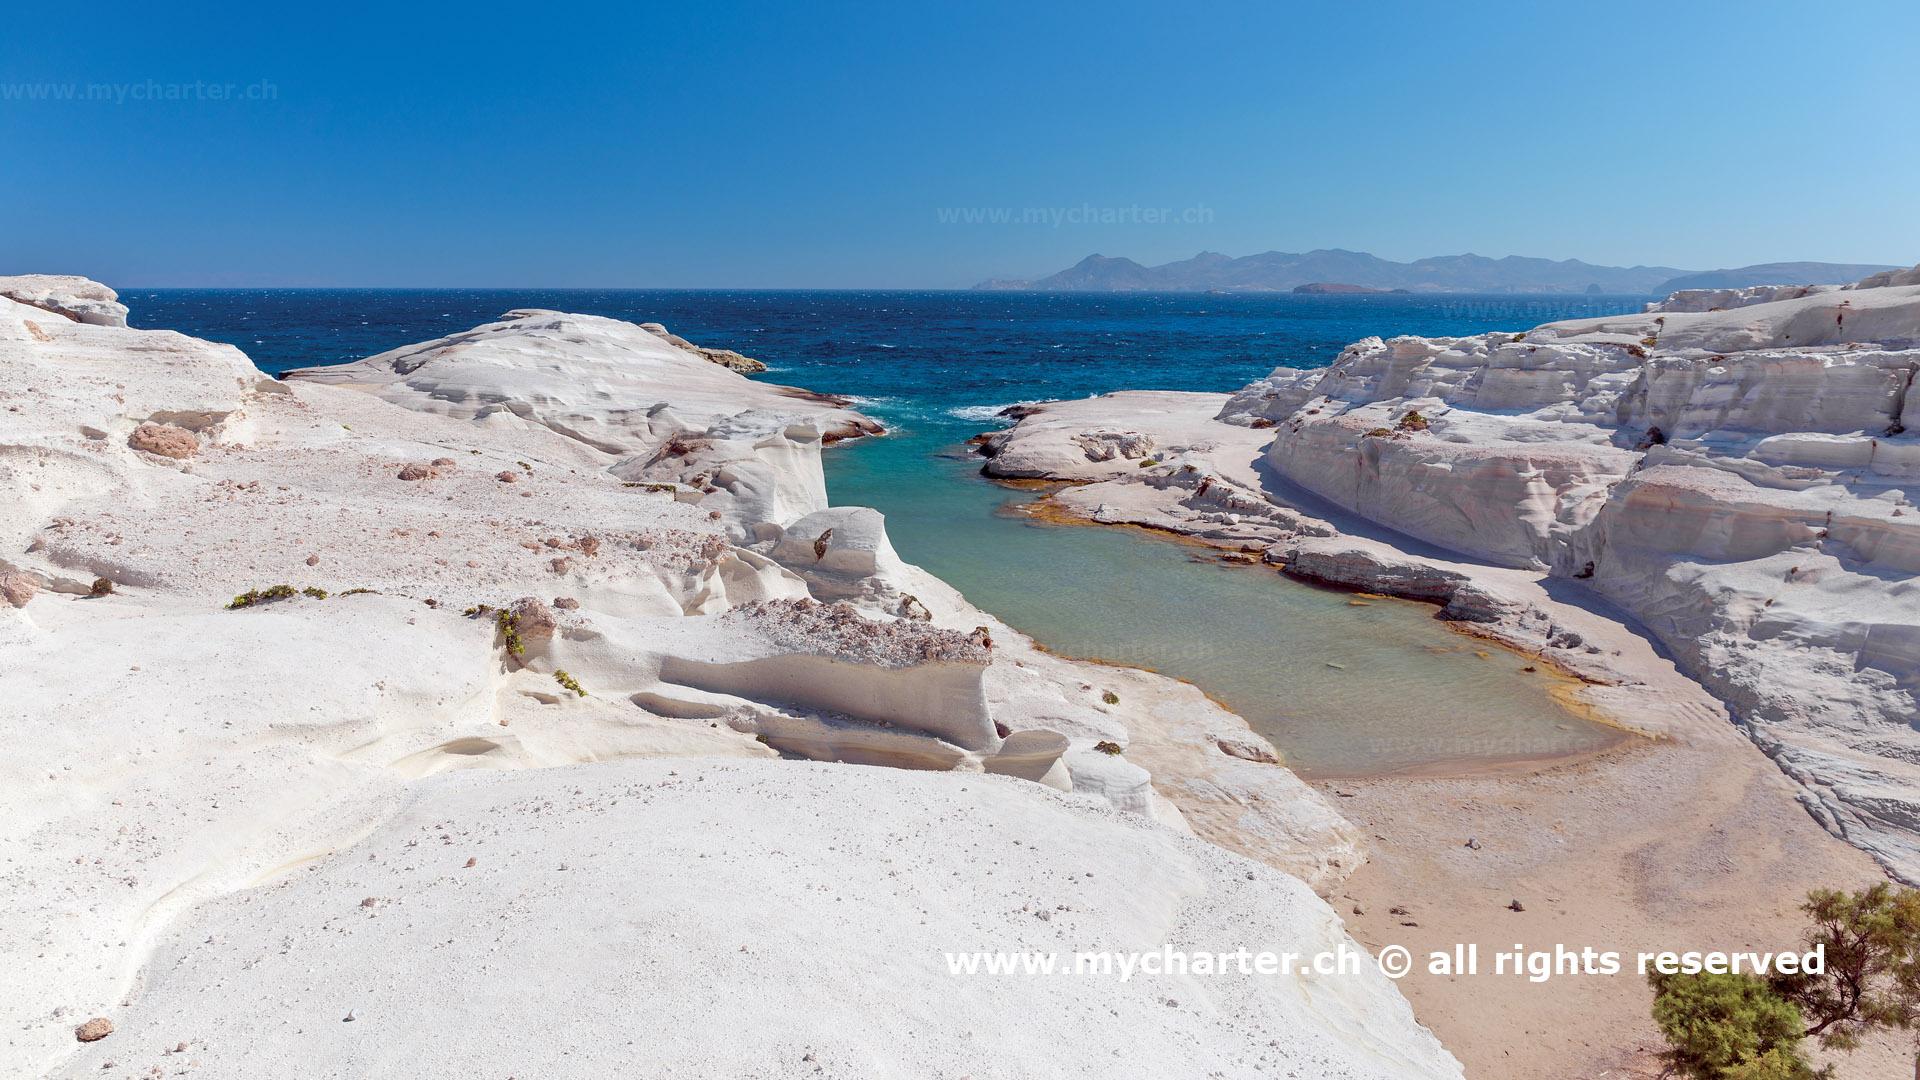 Griechenland - Milos